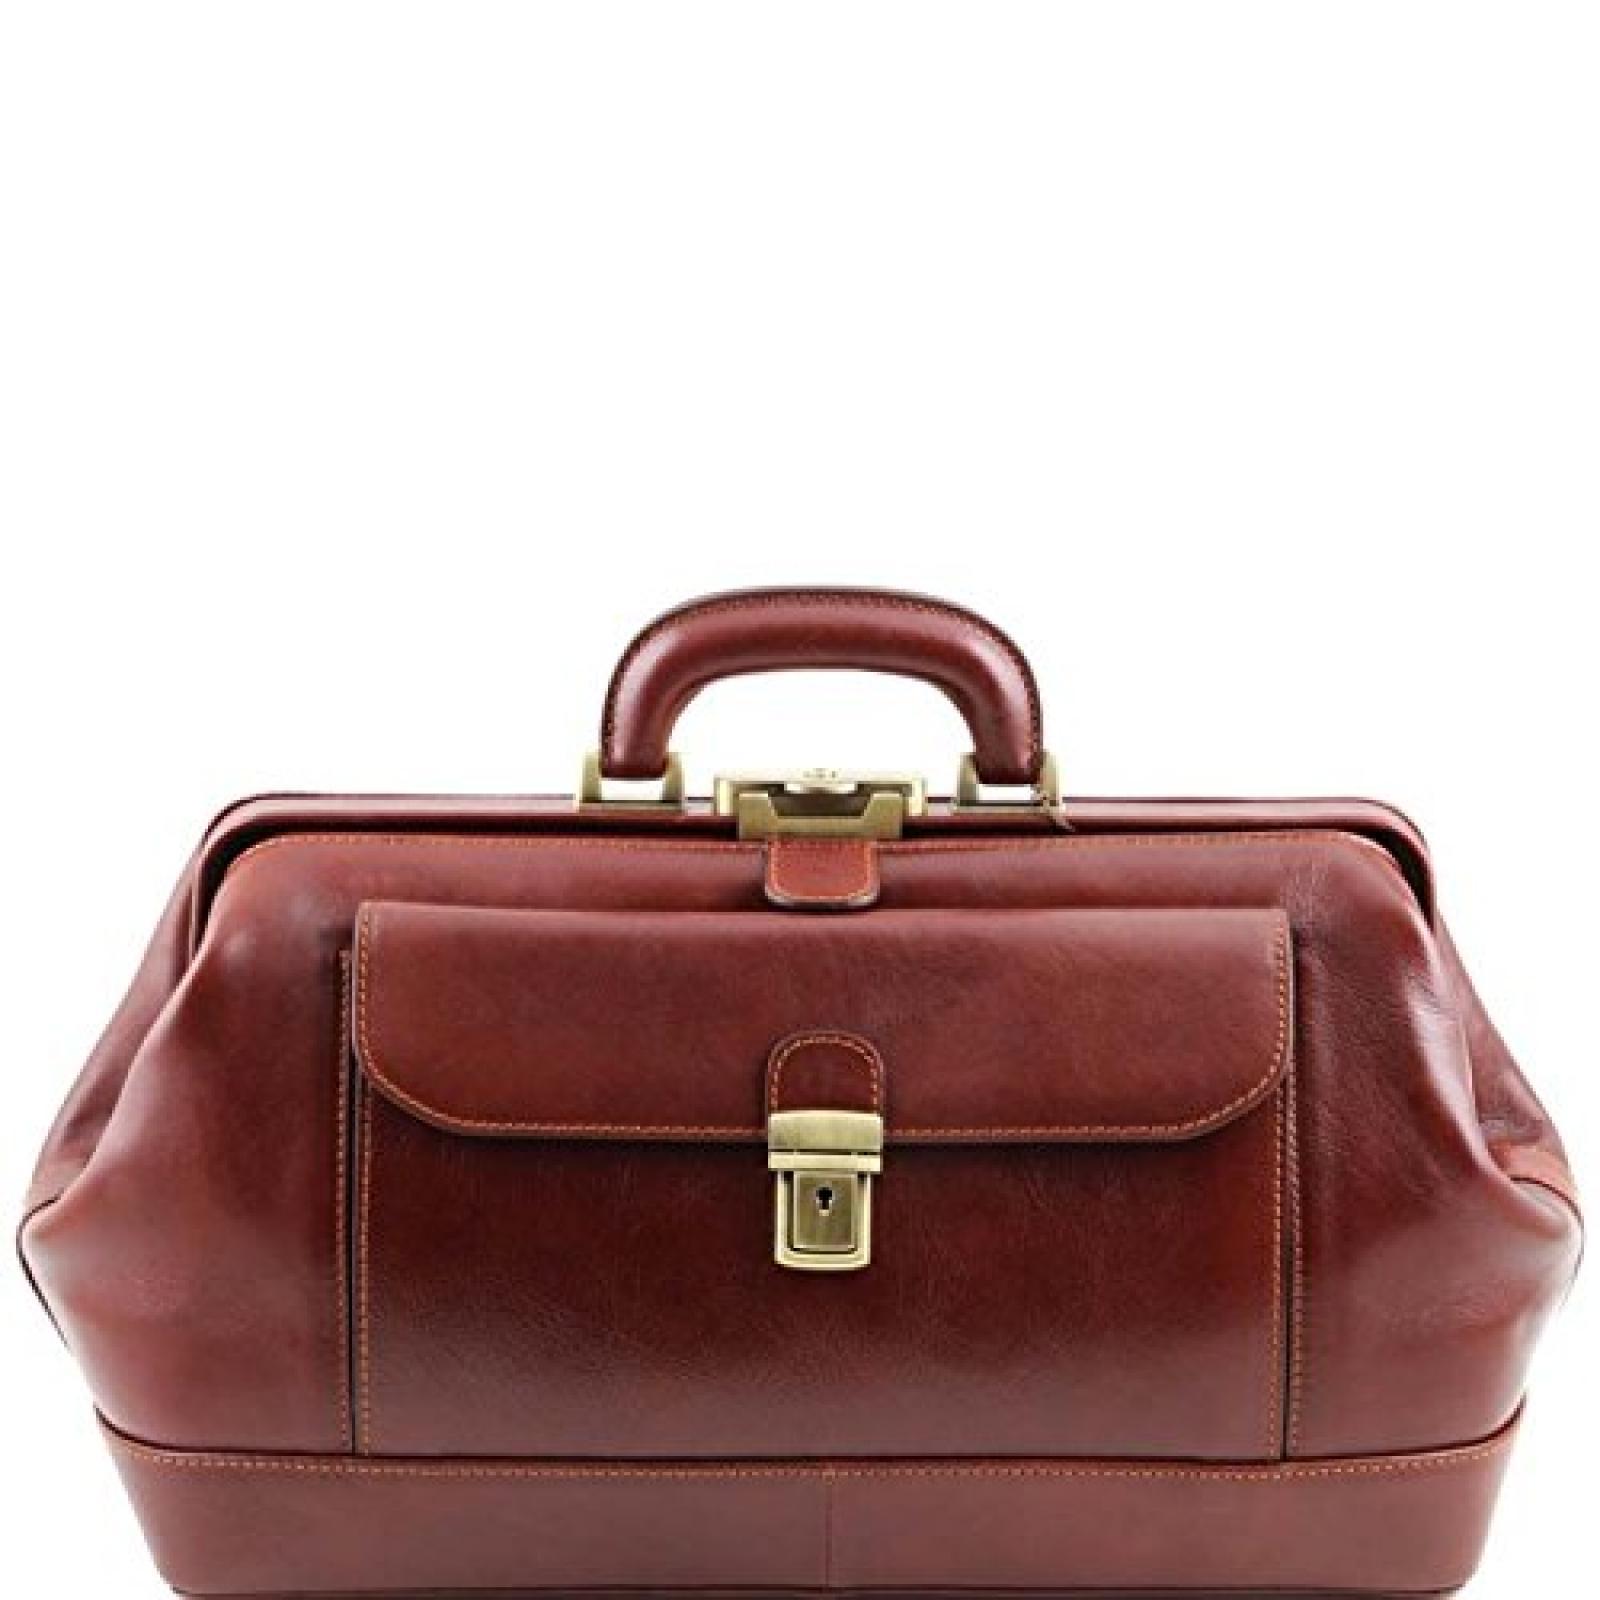 Tuscany Leather - Bernini - Exklusive Arztkoffer Braun - TL141298/1